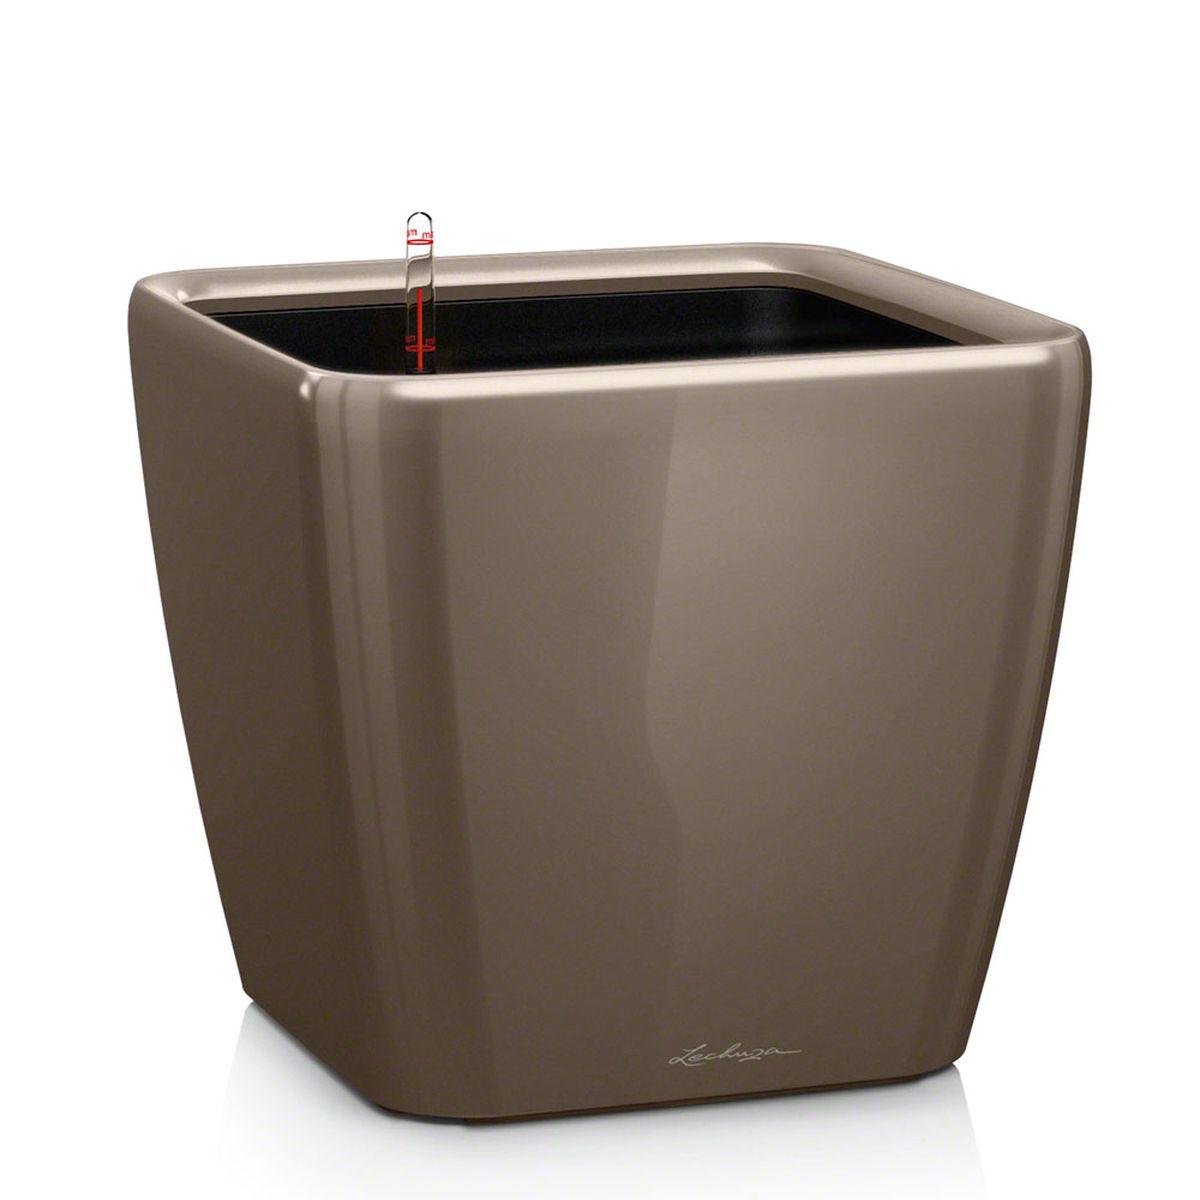 Кашпо Lechuza «Quadro», с системой автополива, цвет: серо-коричневый, 28 х 28 х 26 см